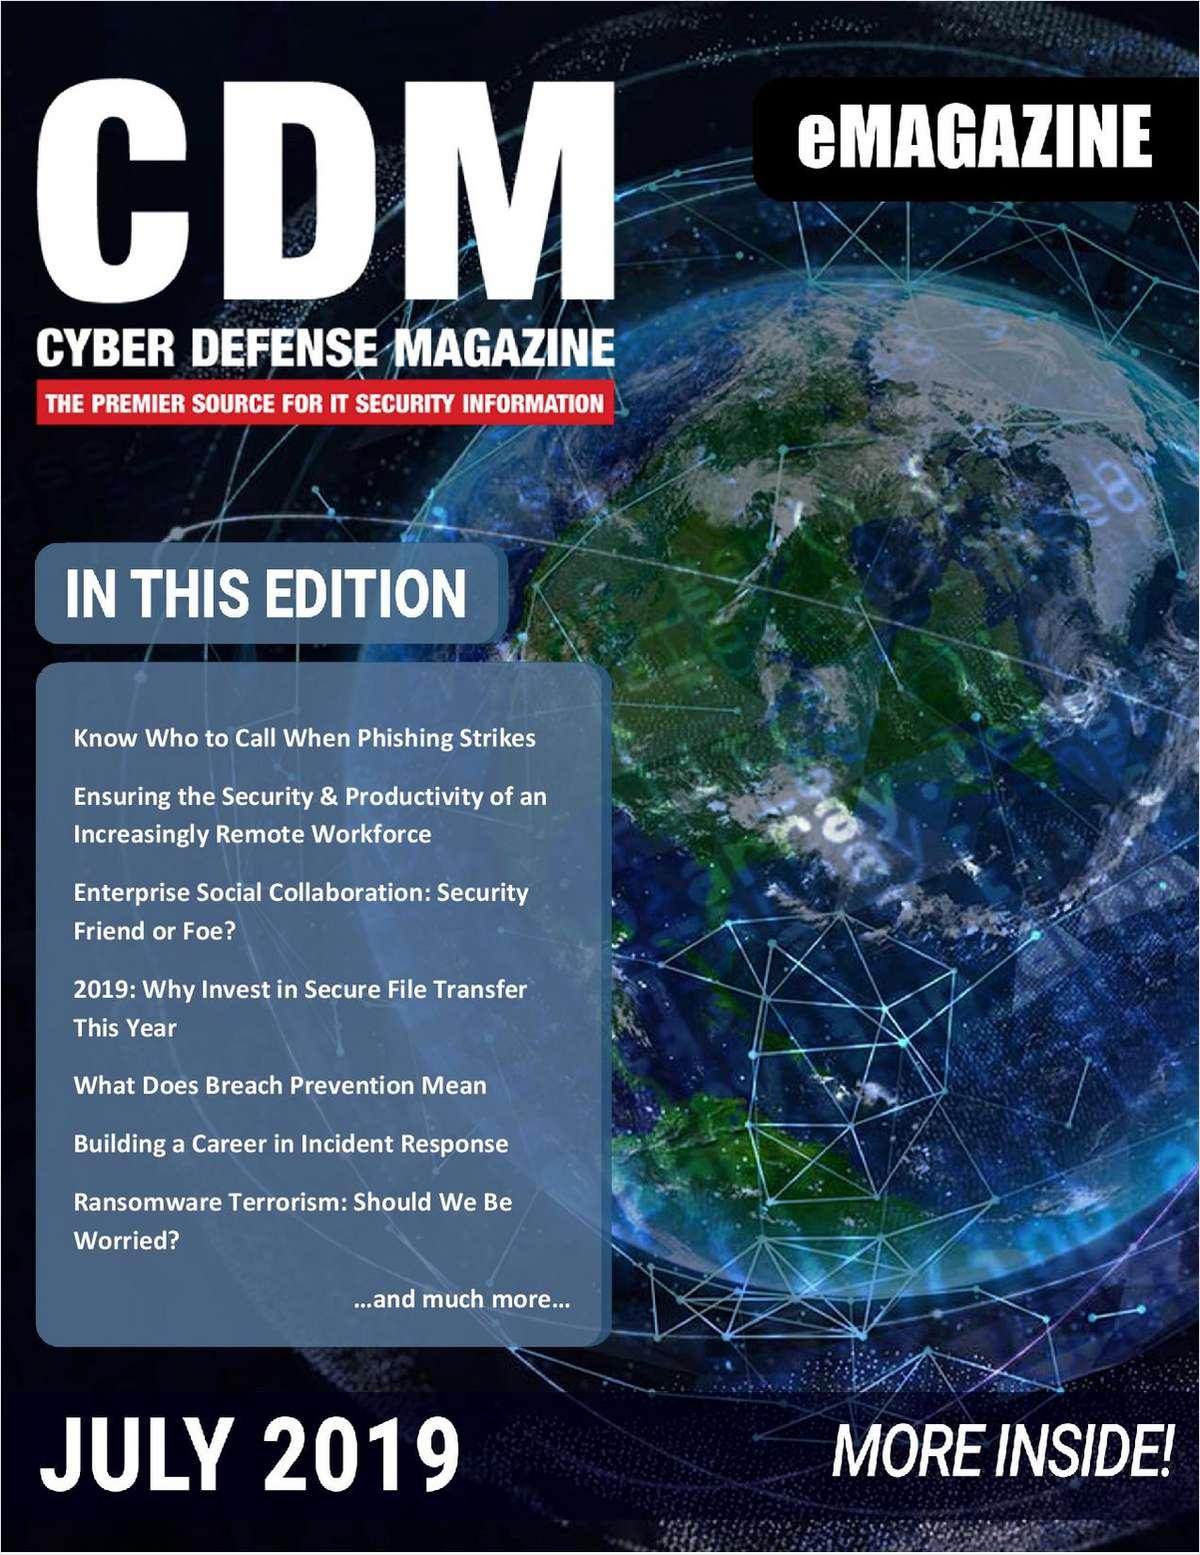 Cyber Defense eMagazine - July 2019 Edition